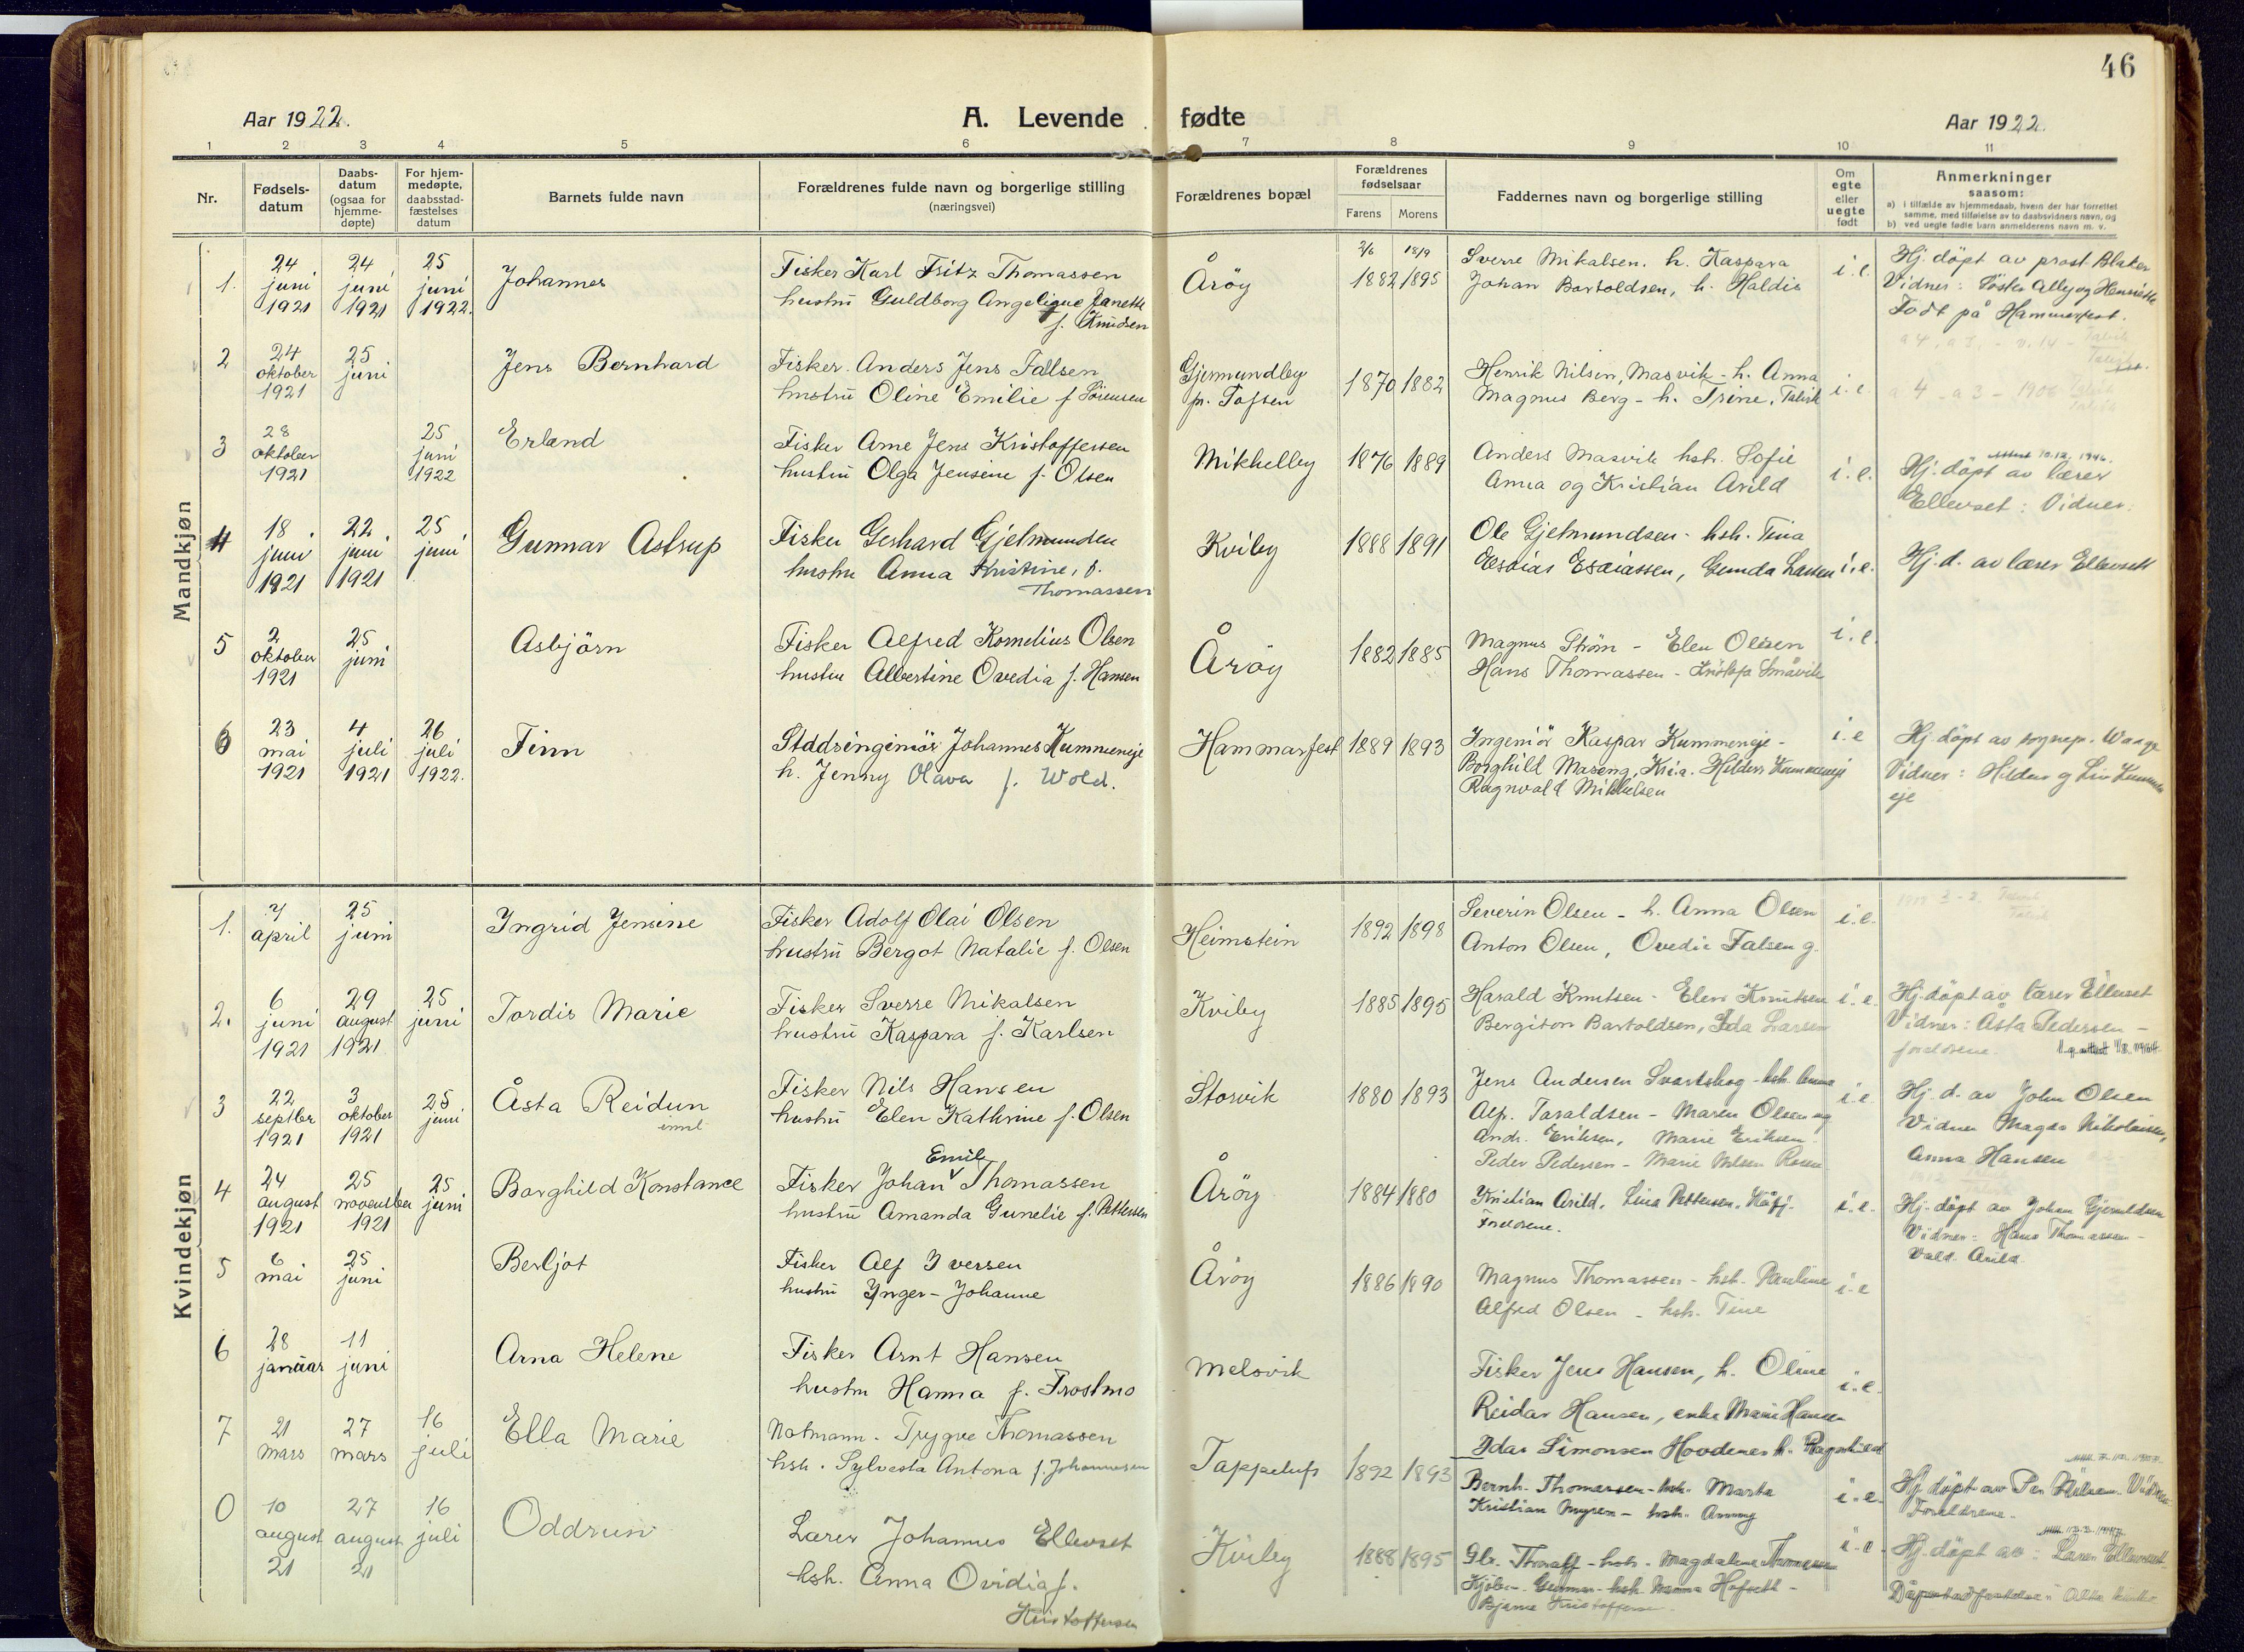 SATØ, Talvik sokneprestkontor, H/Ha/L0018kirke: Ministerialbok nr. 18, 1915-1924, s. 46